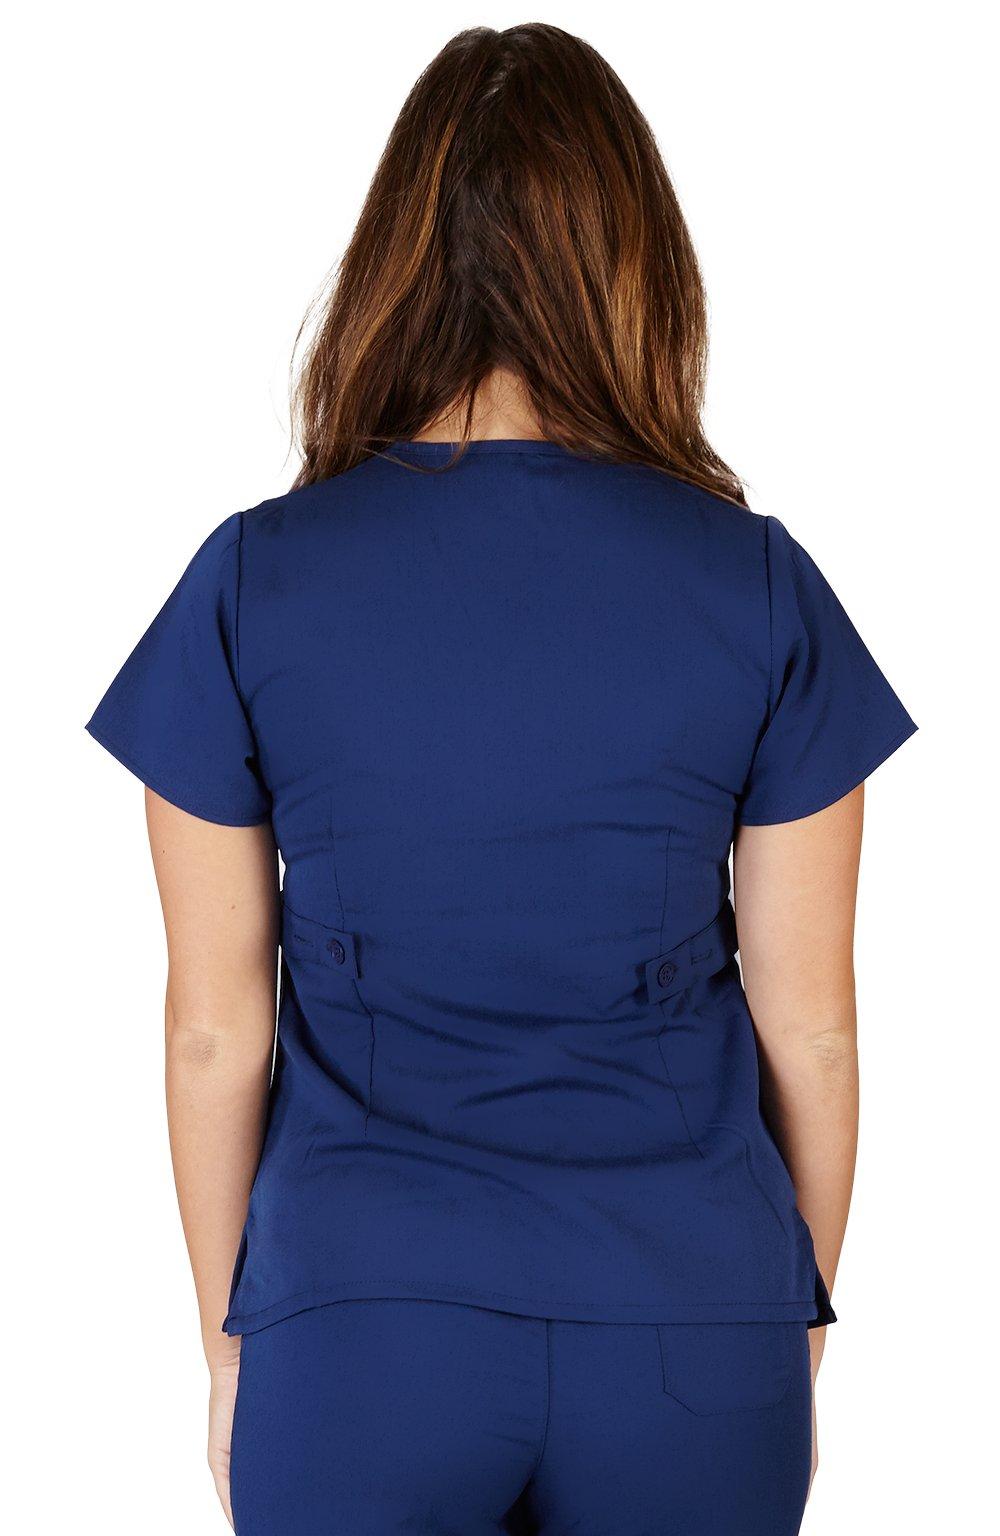 Ultra Soft Brand Scrubs - Premium Womens Junior Fit 3 Pocket Mock Wrap Scrub Top, Navy 36150-X-Small by ULTRASOFT SCRUBS (Image #2)